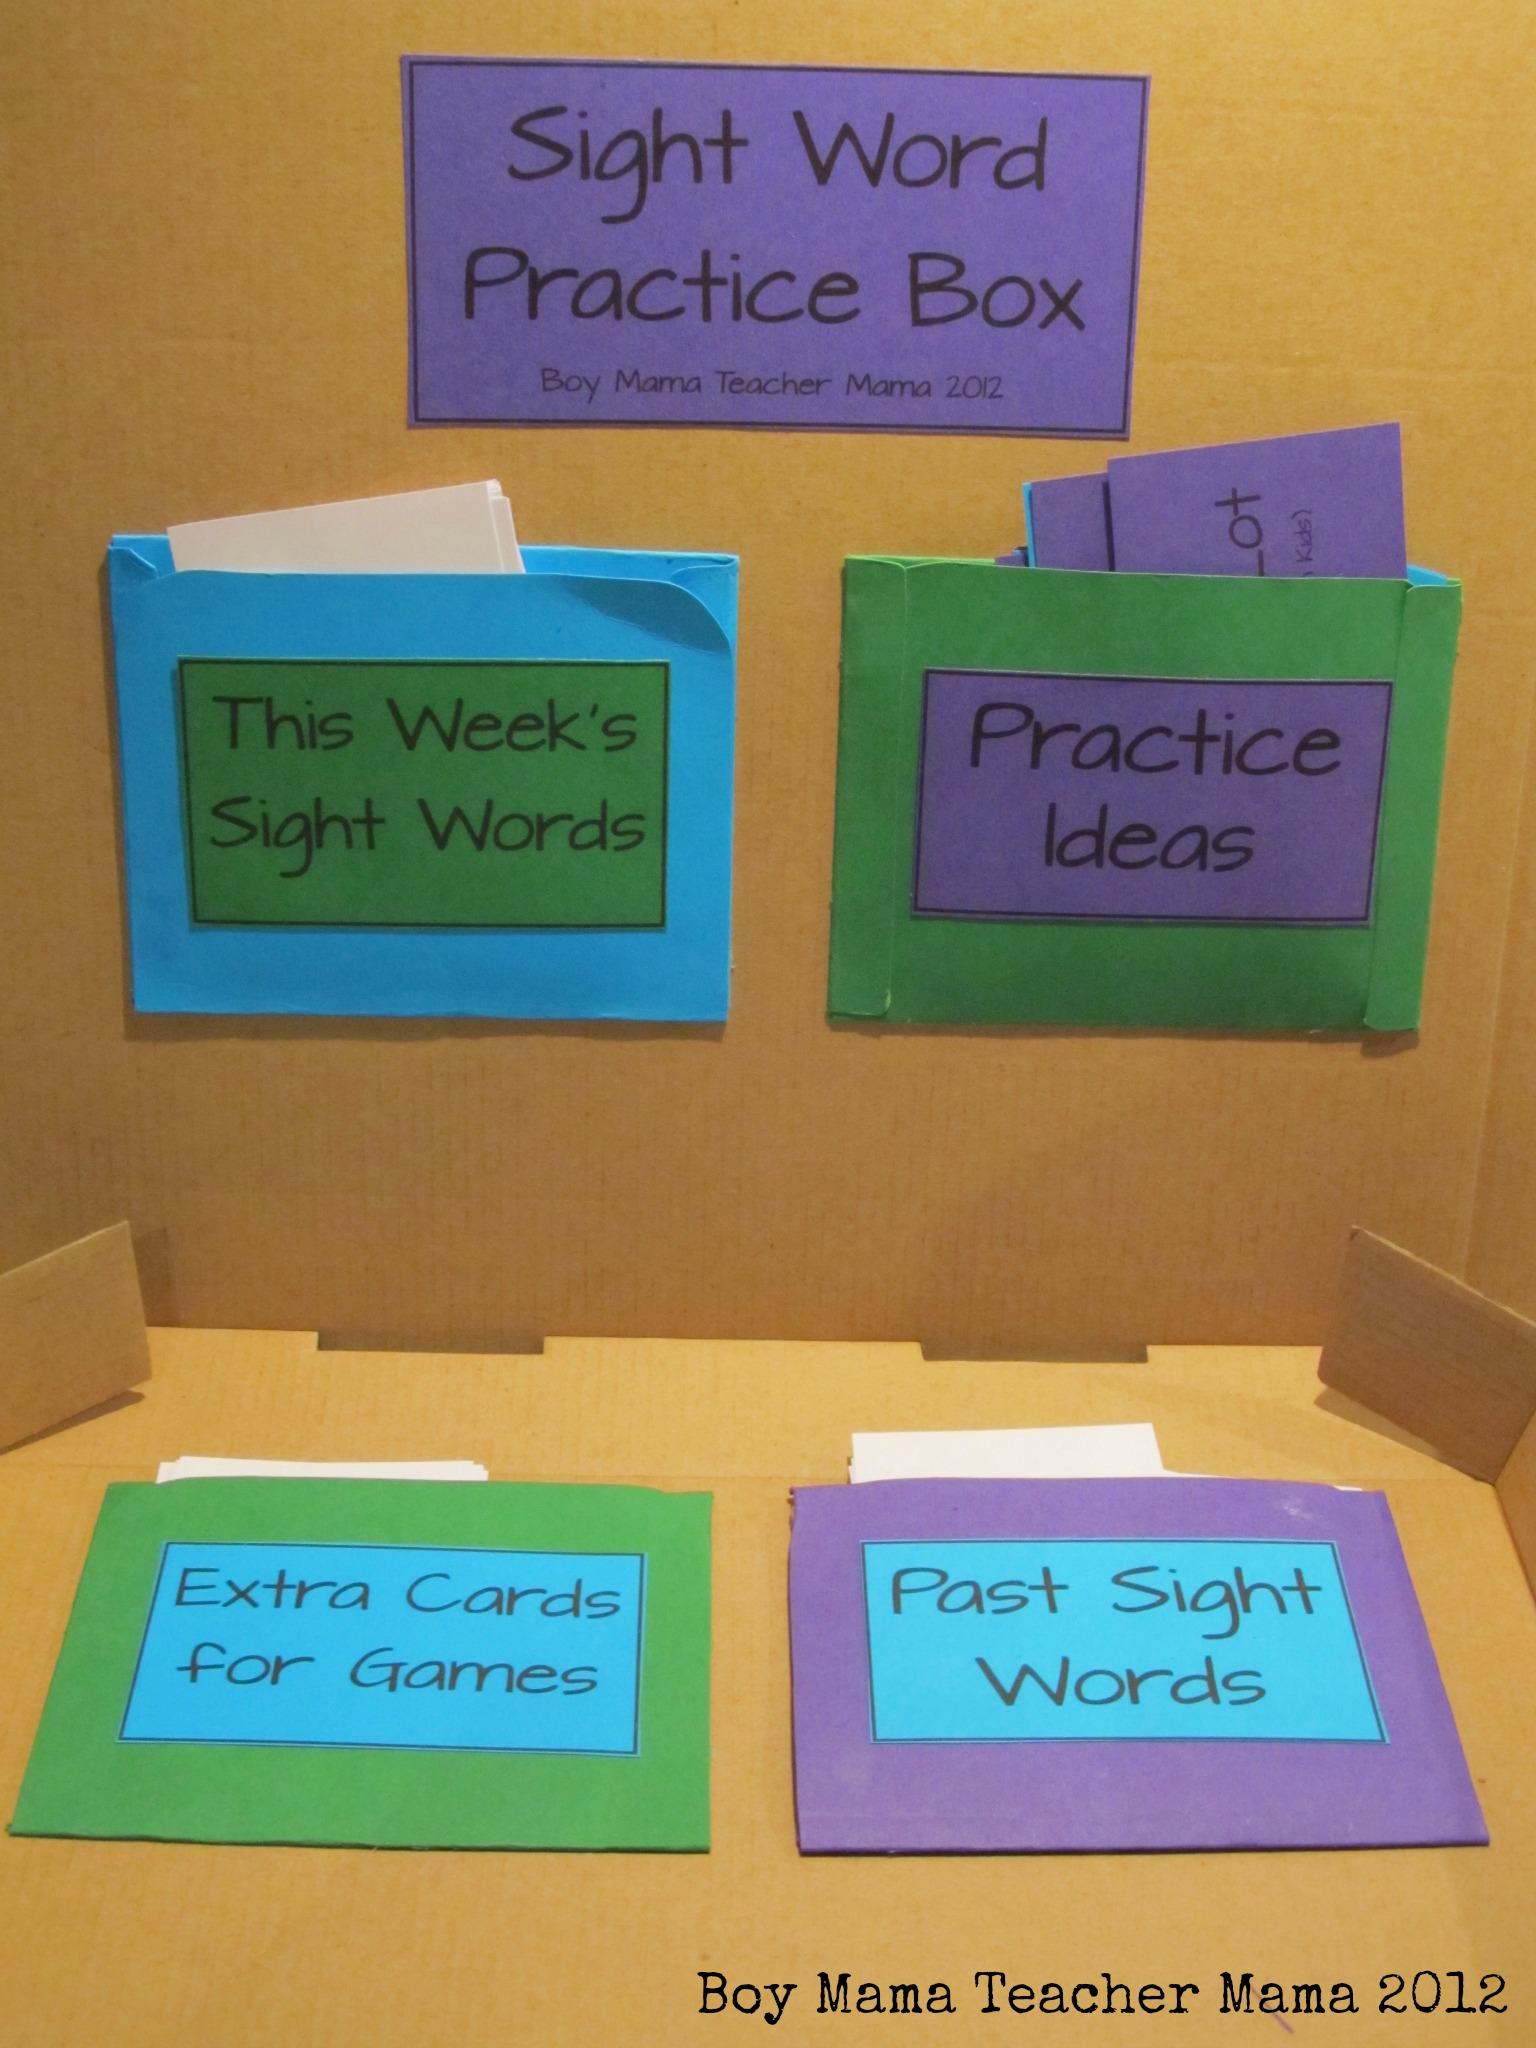 Boy Mama Teacher Mama: Sight Word Practice Box